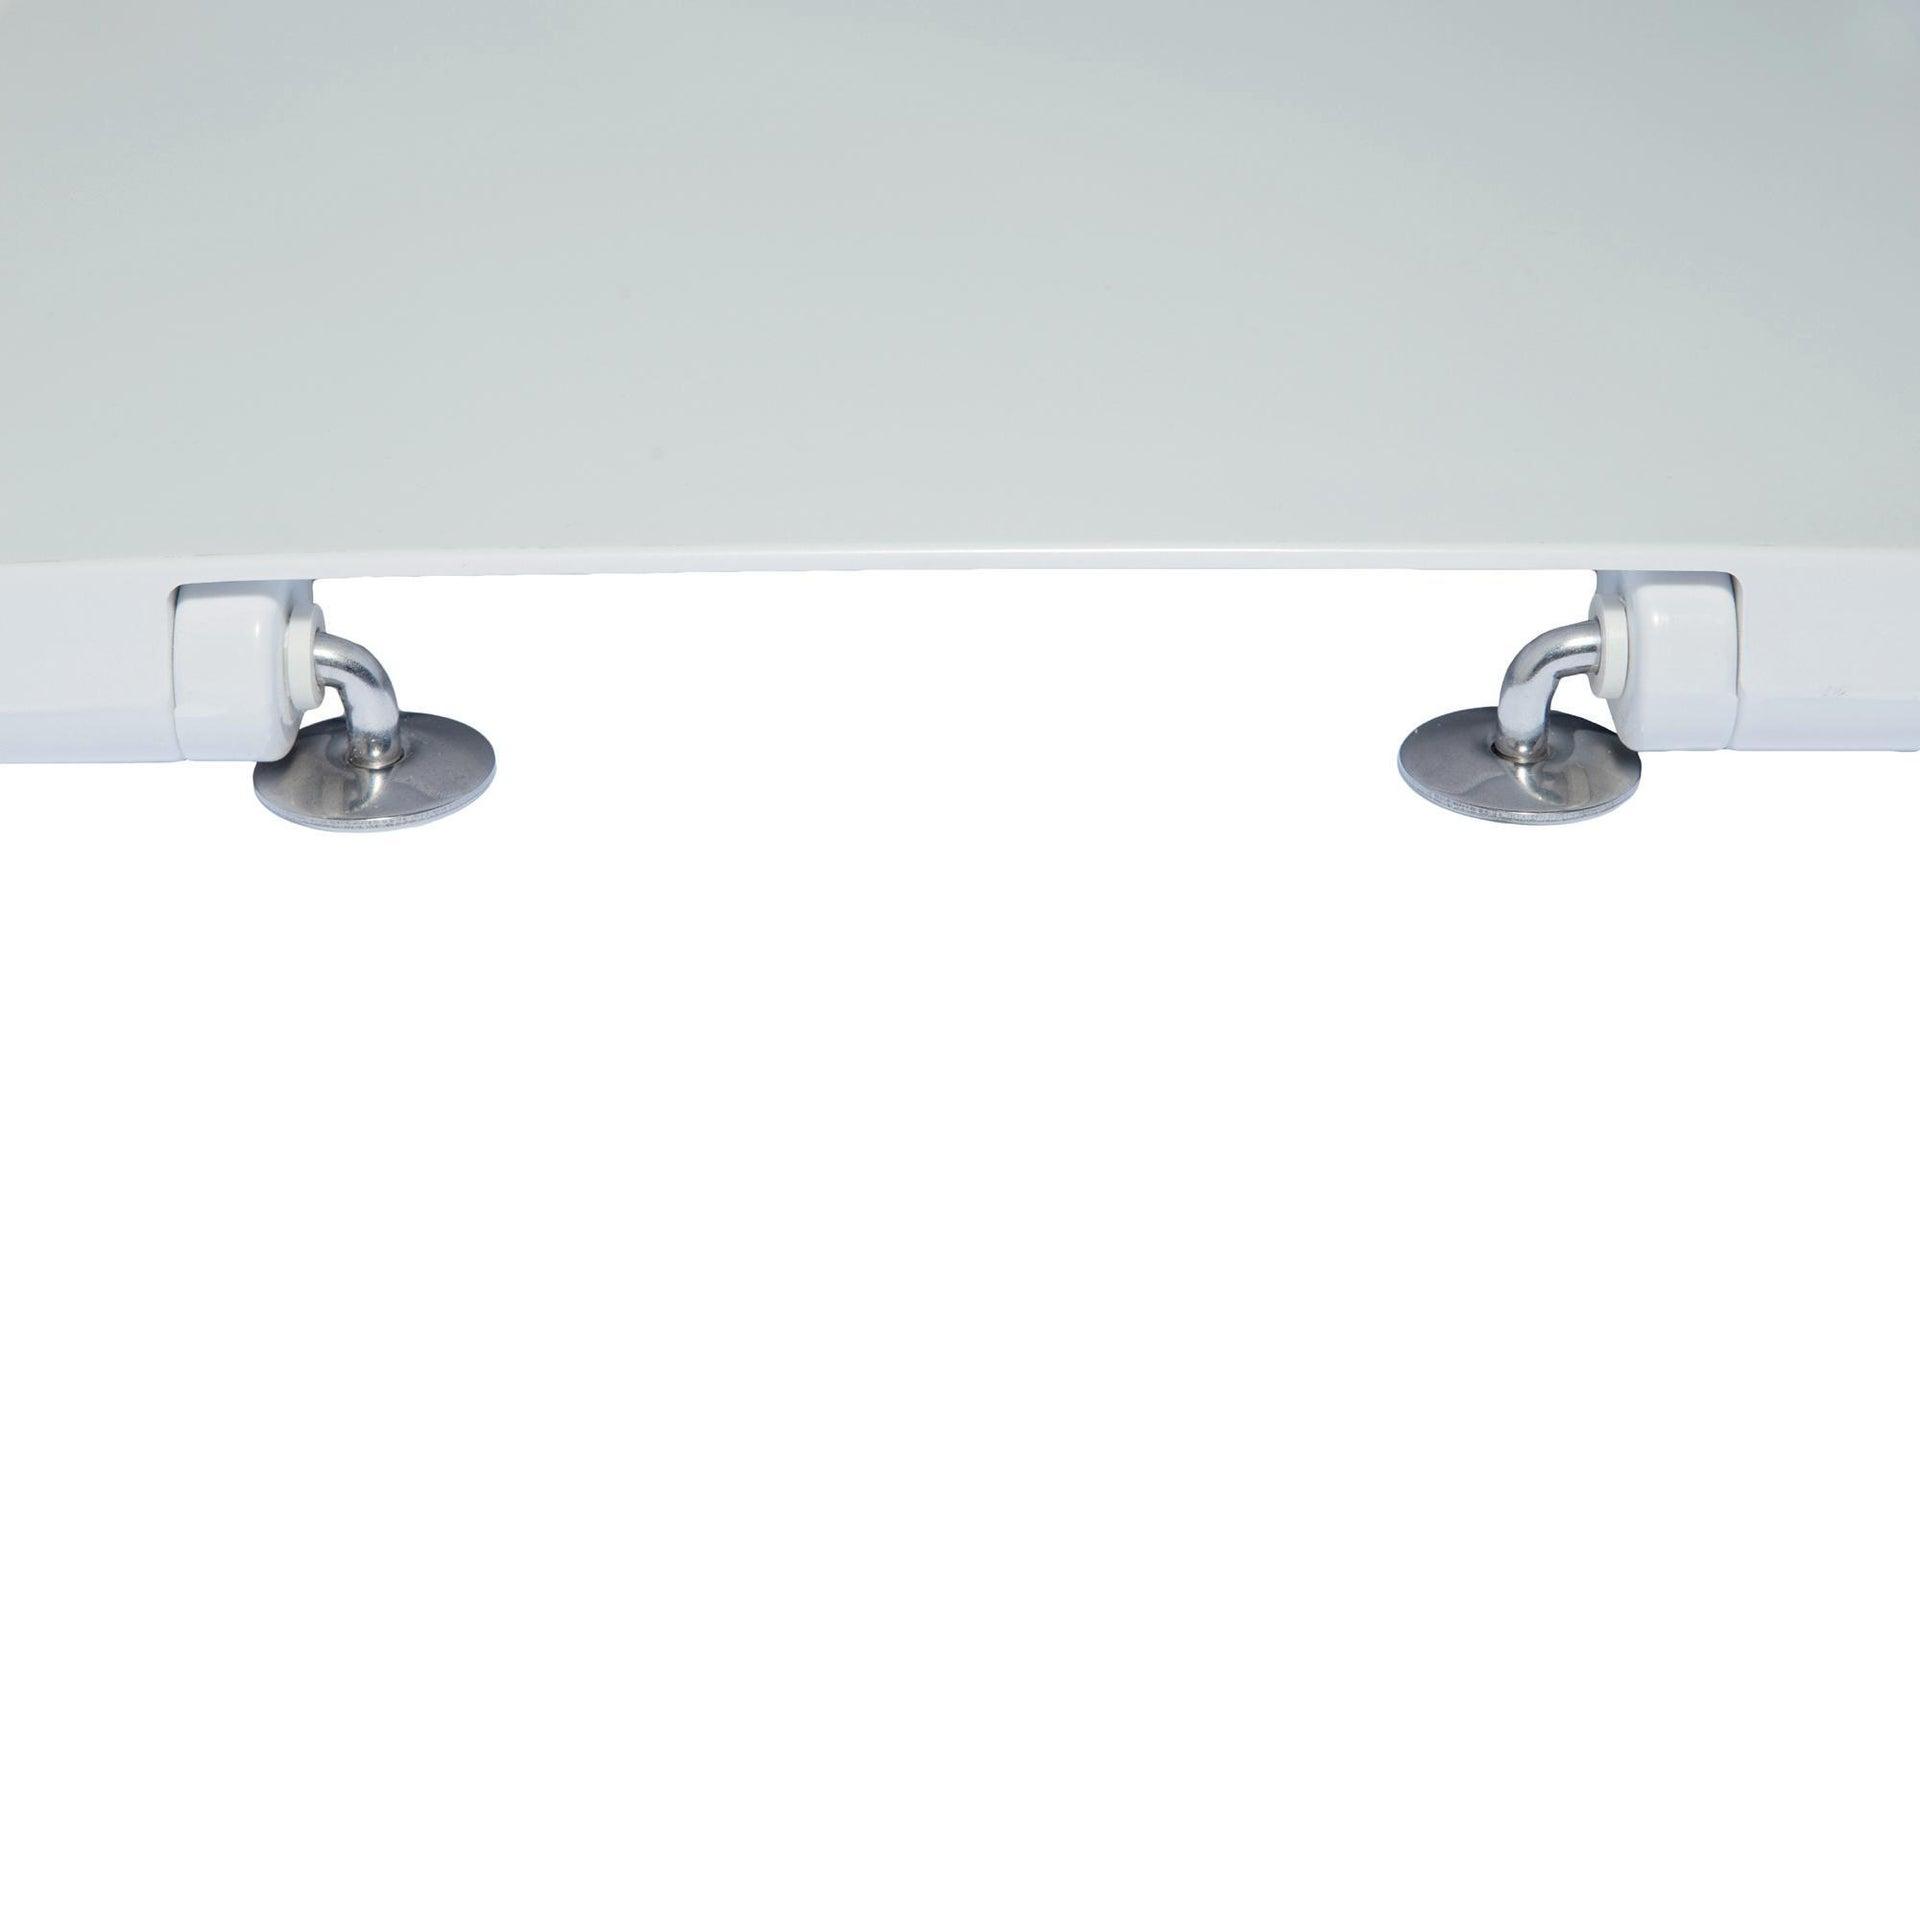 Copriwater ovale Originale per serie sanitari Gemma 2 IDEAL STANDARD termoindurente bianco - 2